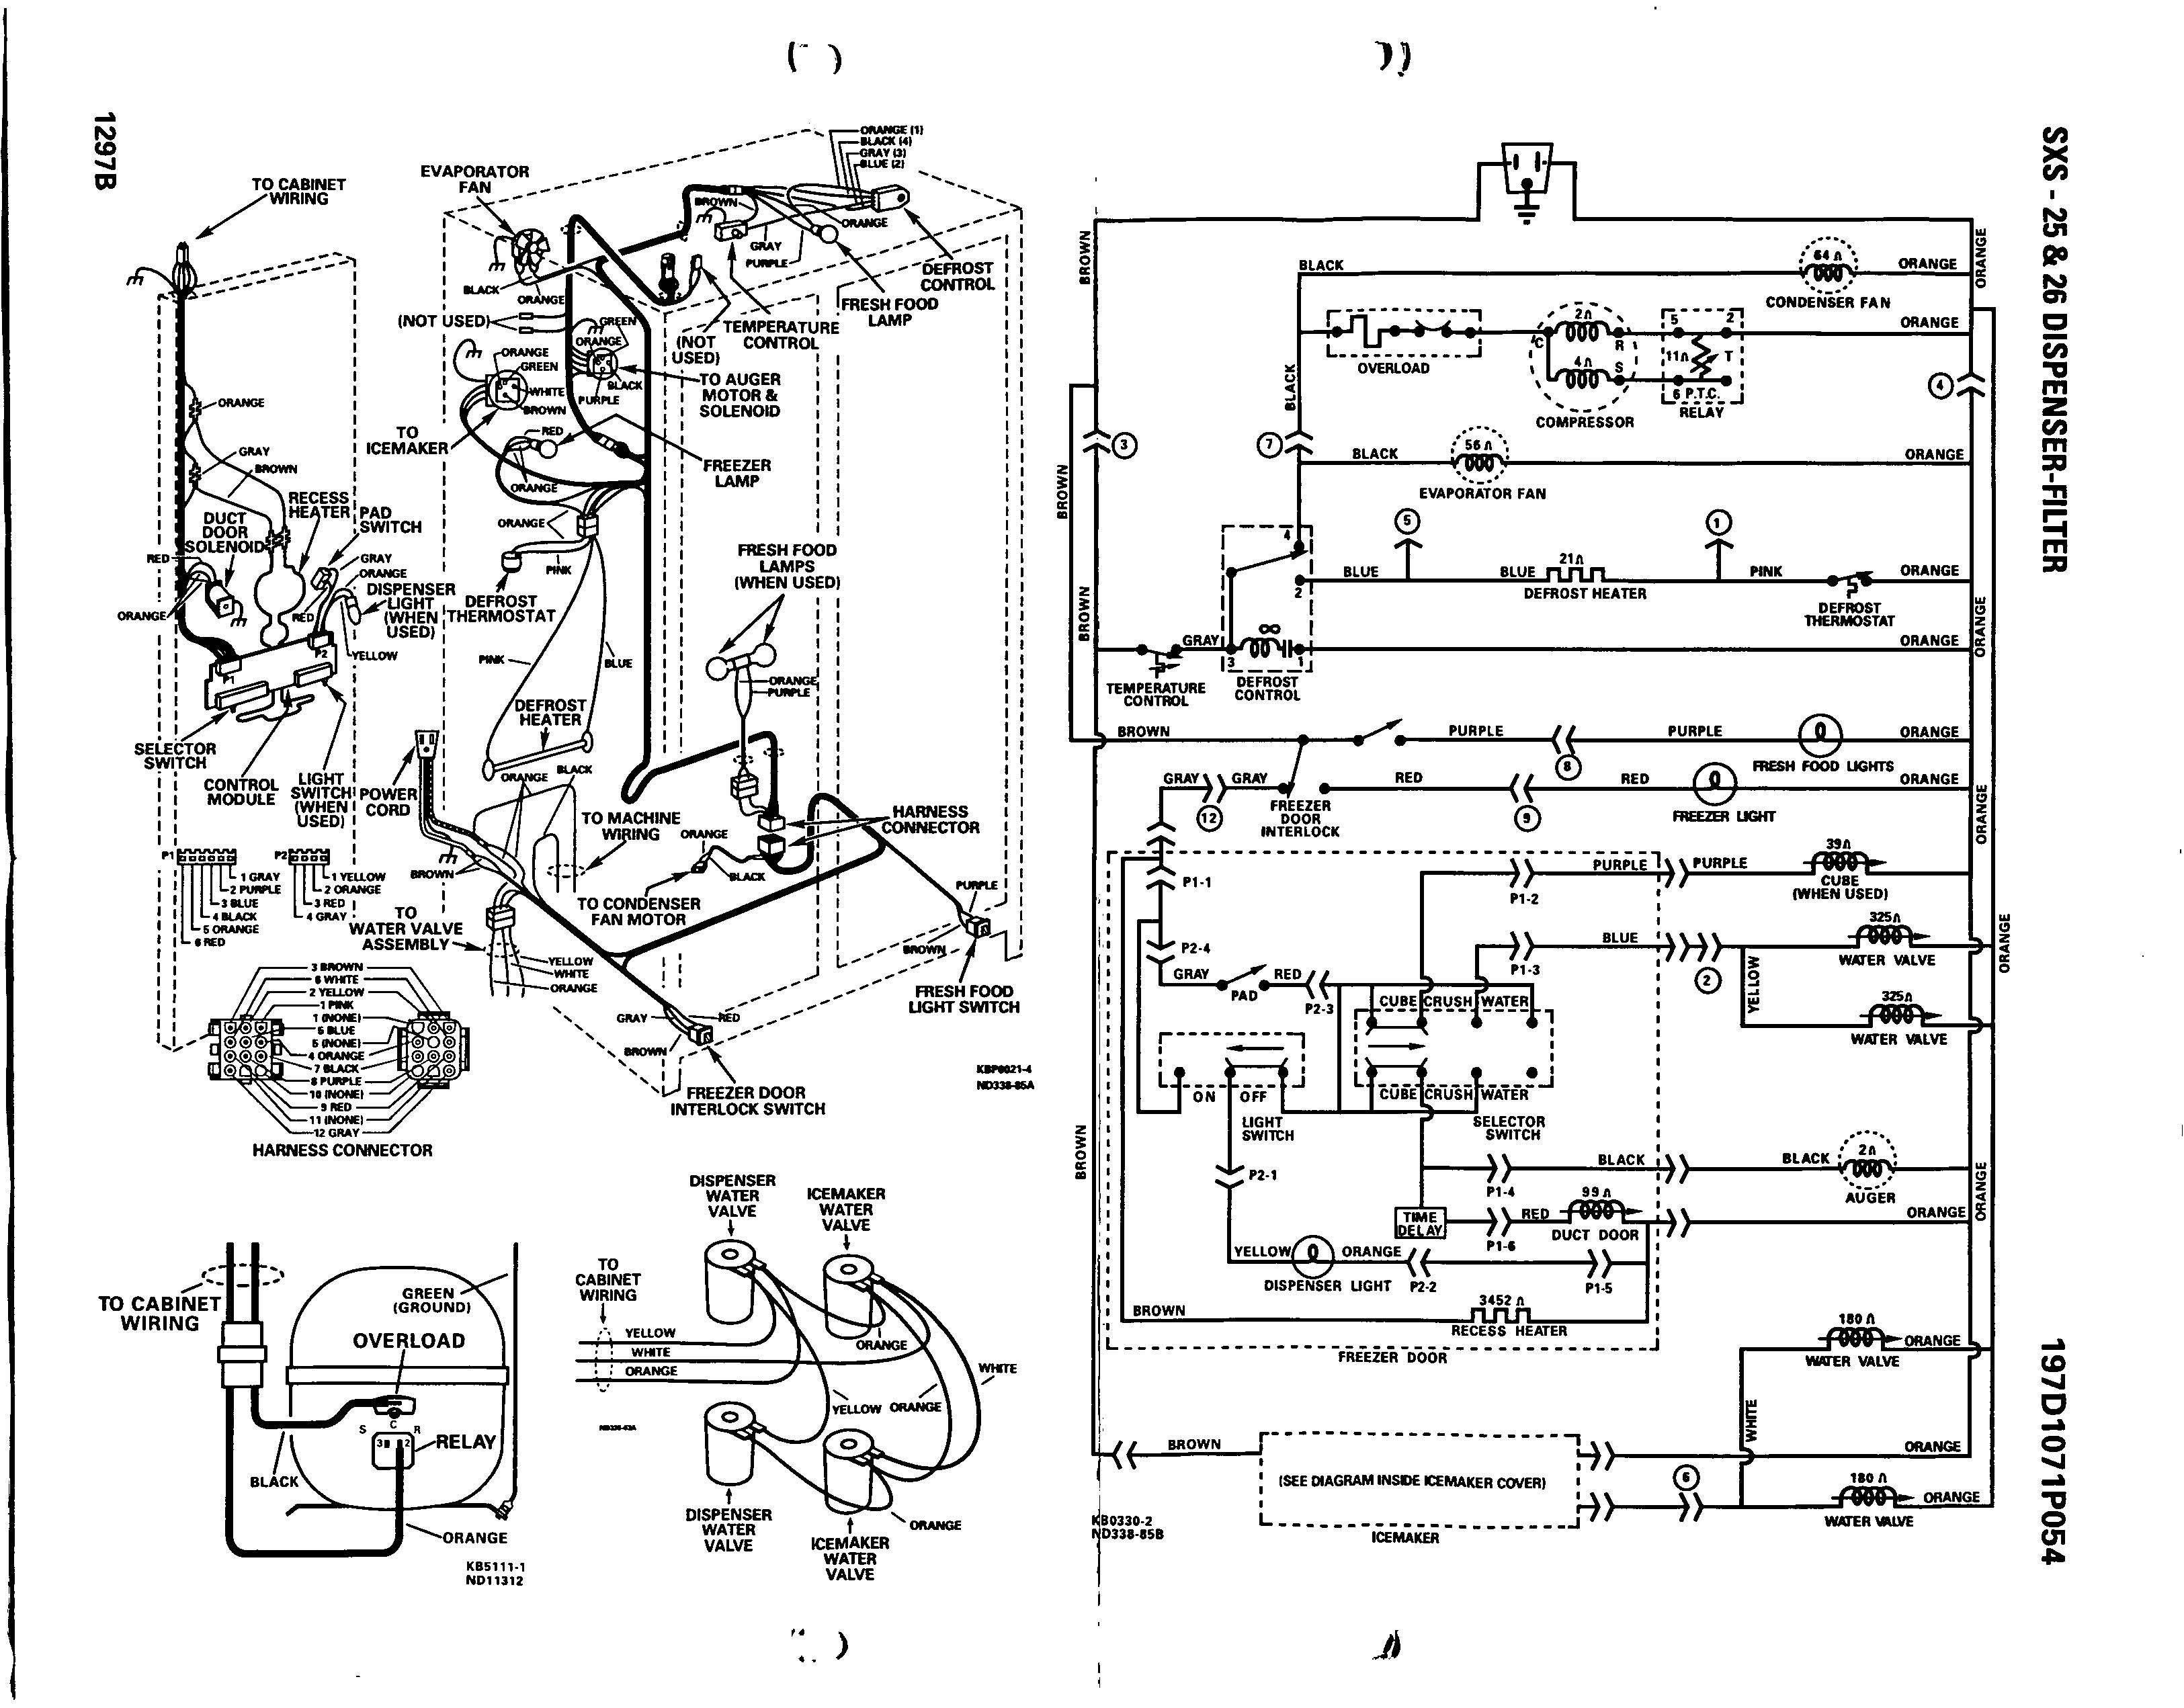 16 Great Ideas Of Wiring Diagram Of Washing Machine